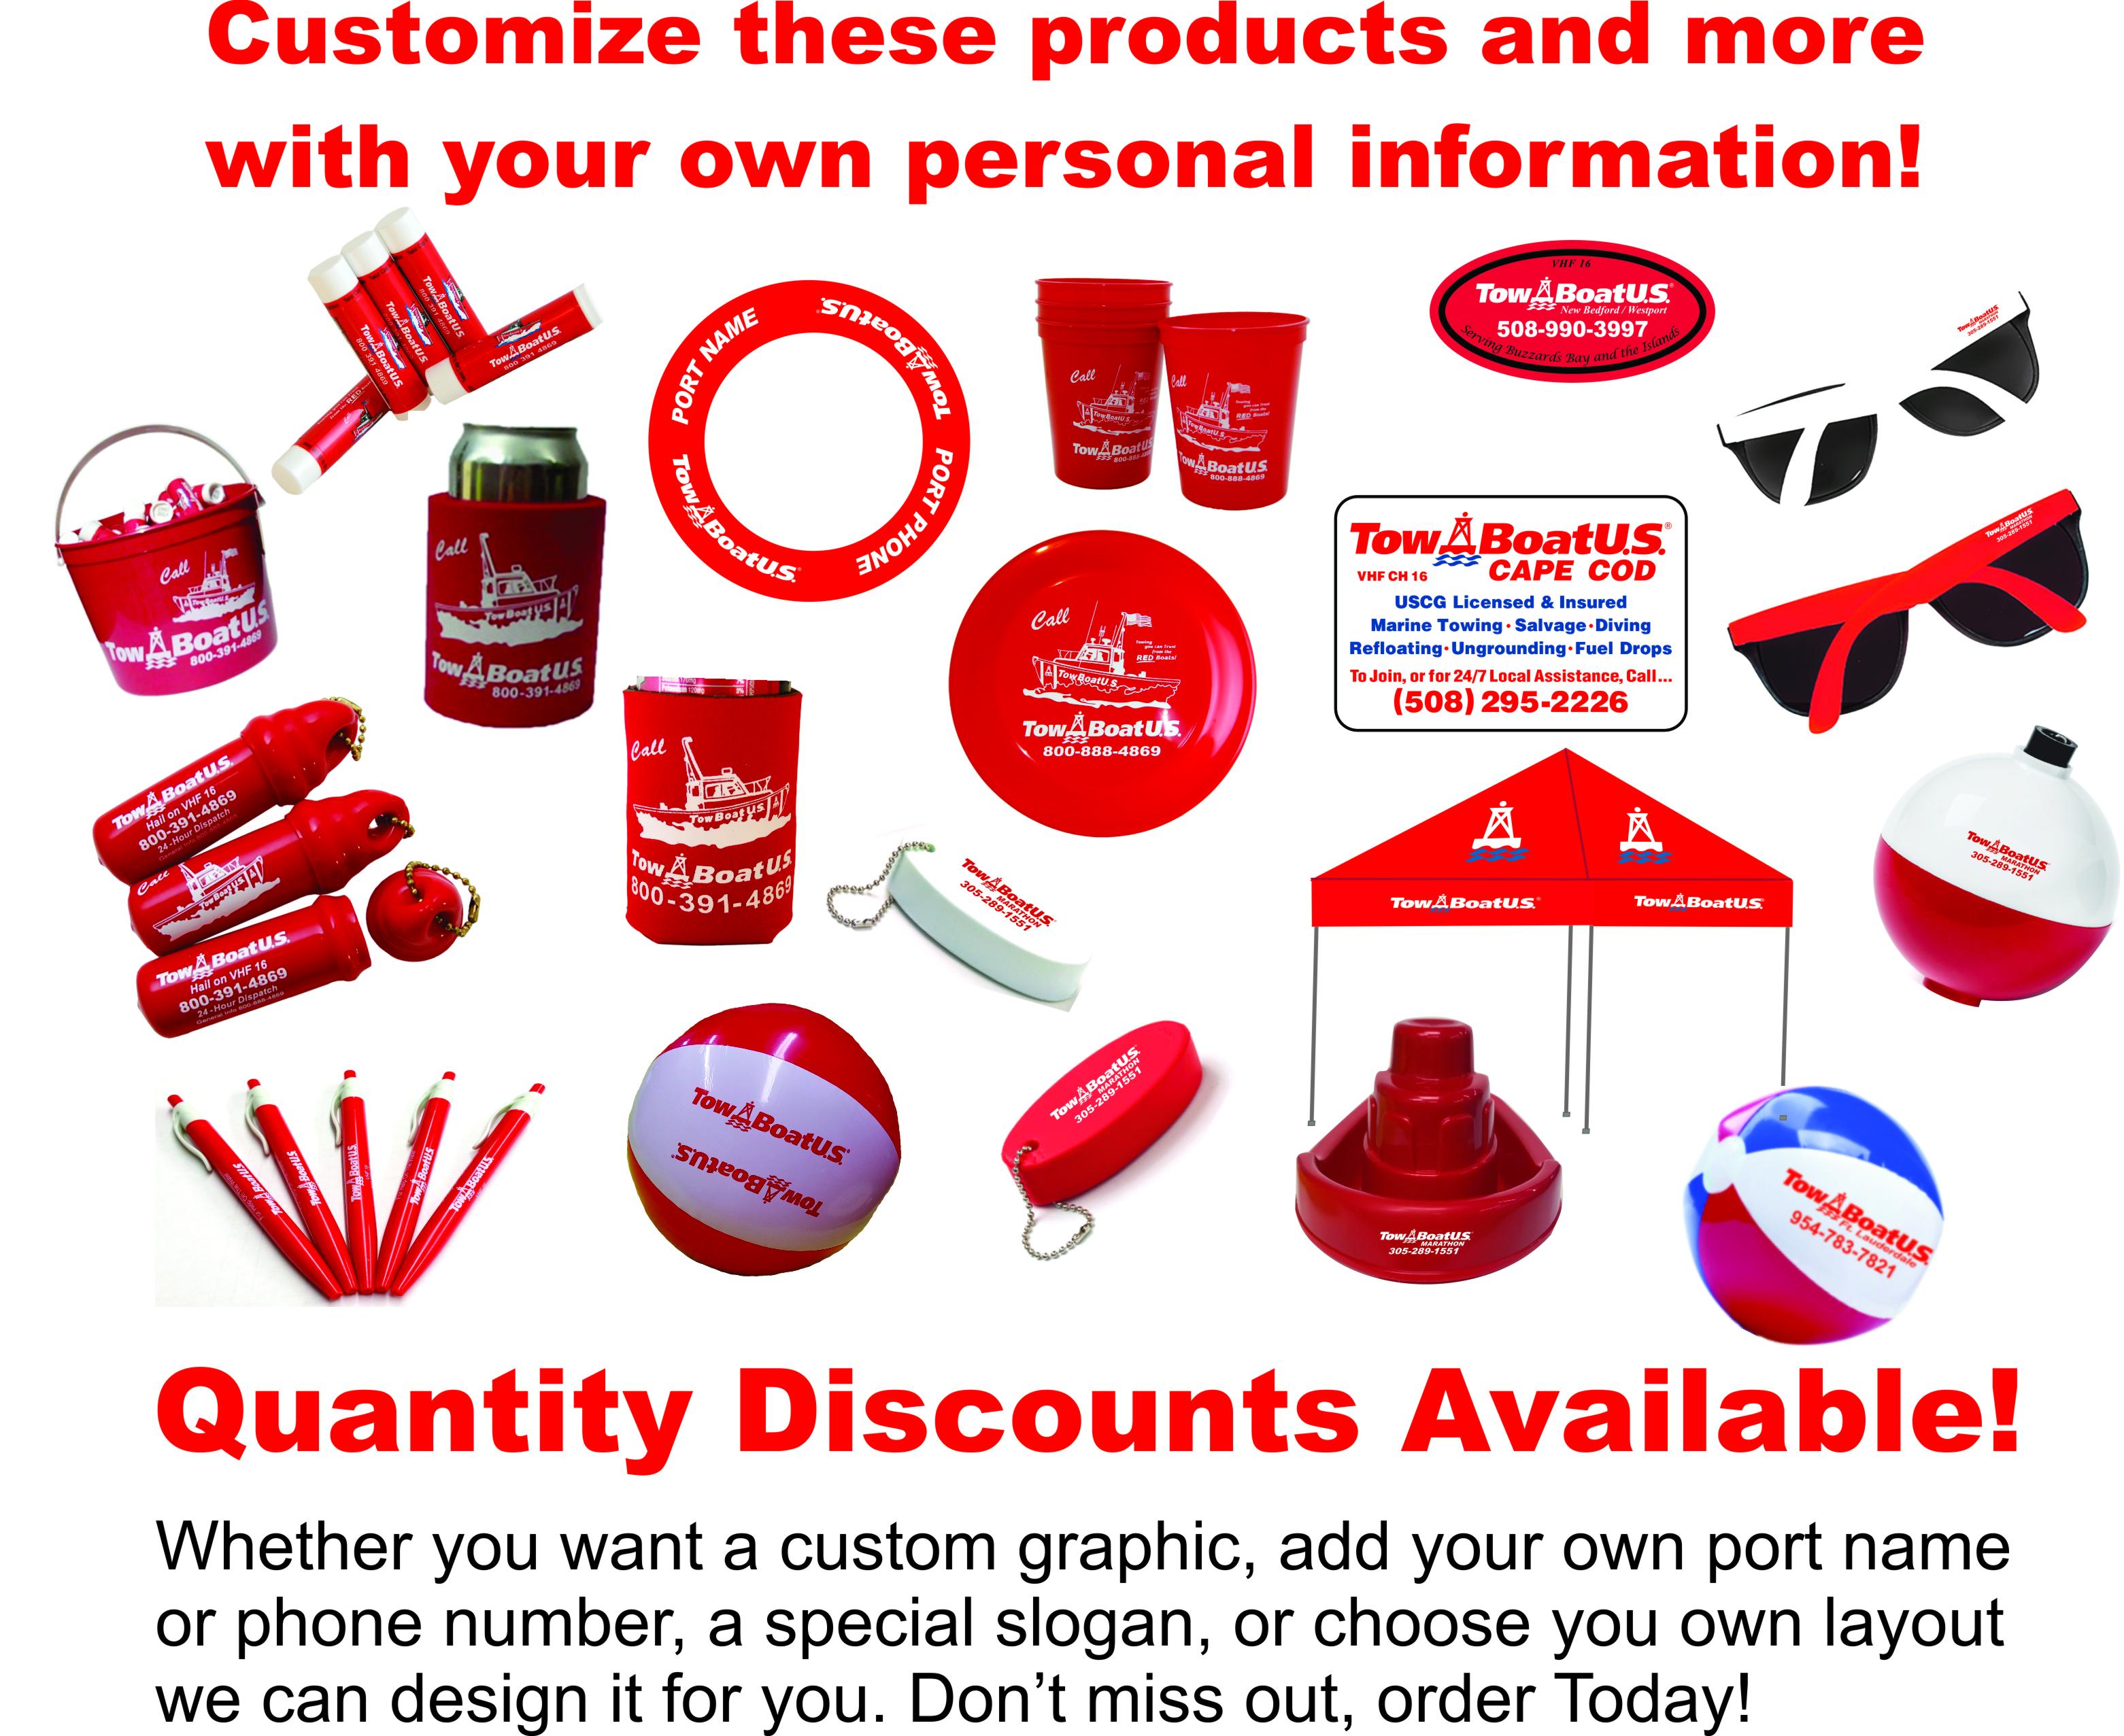 custom-products-catalog-pic2.jpg